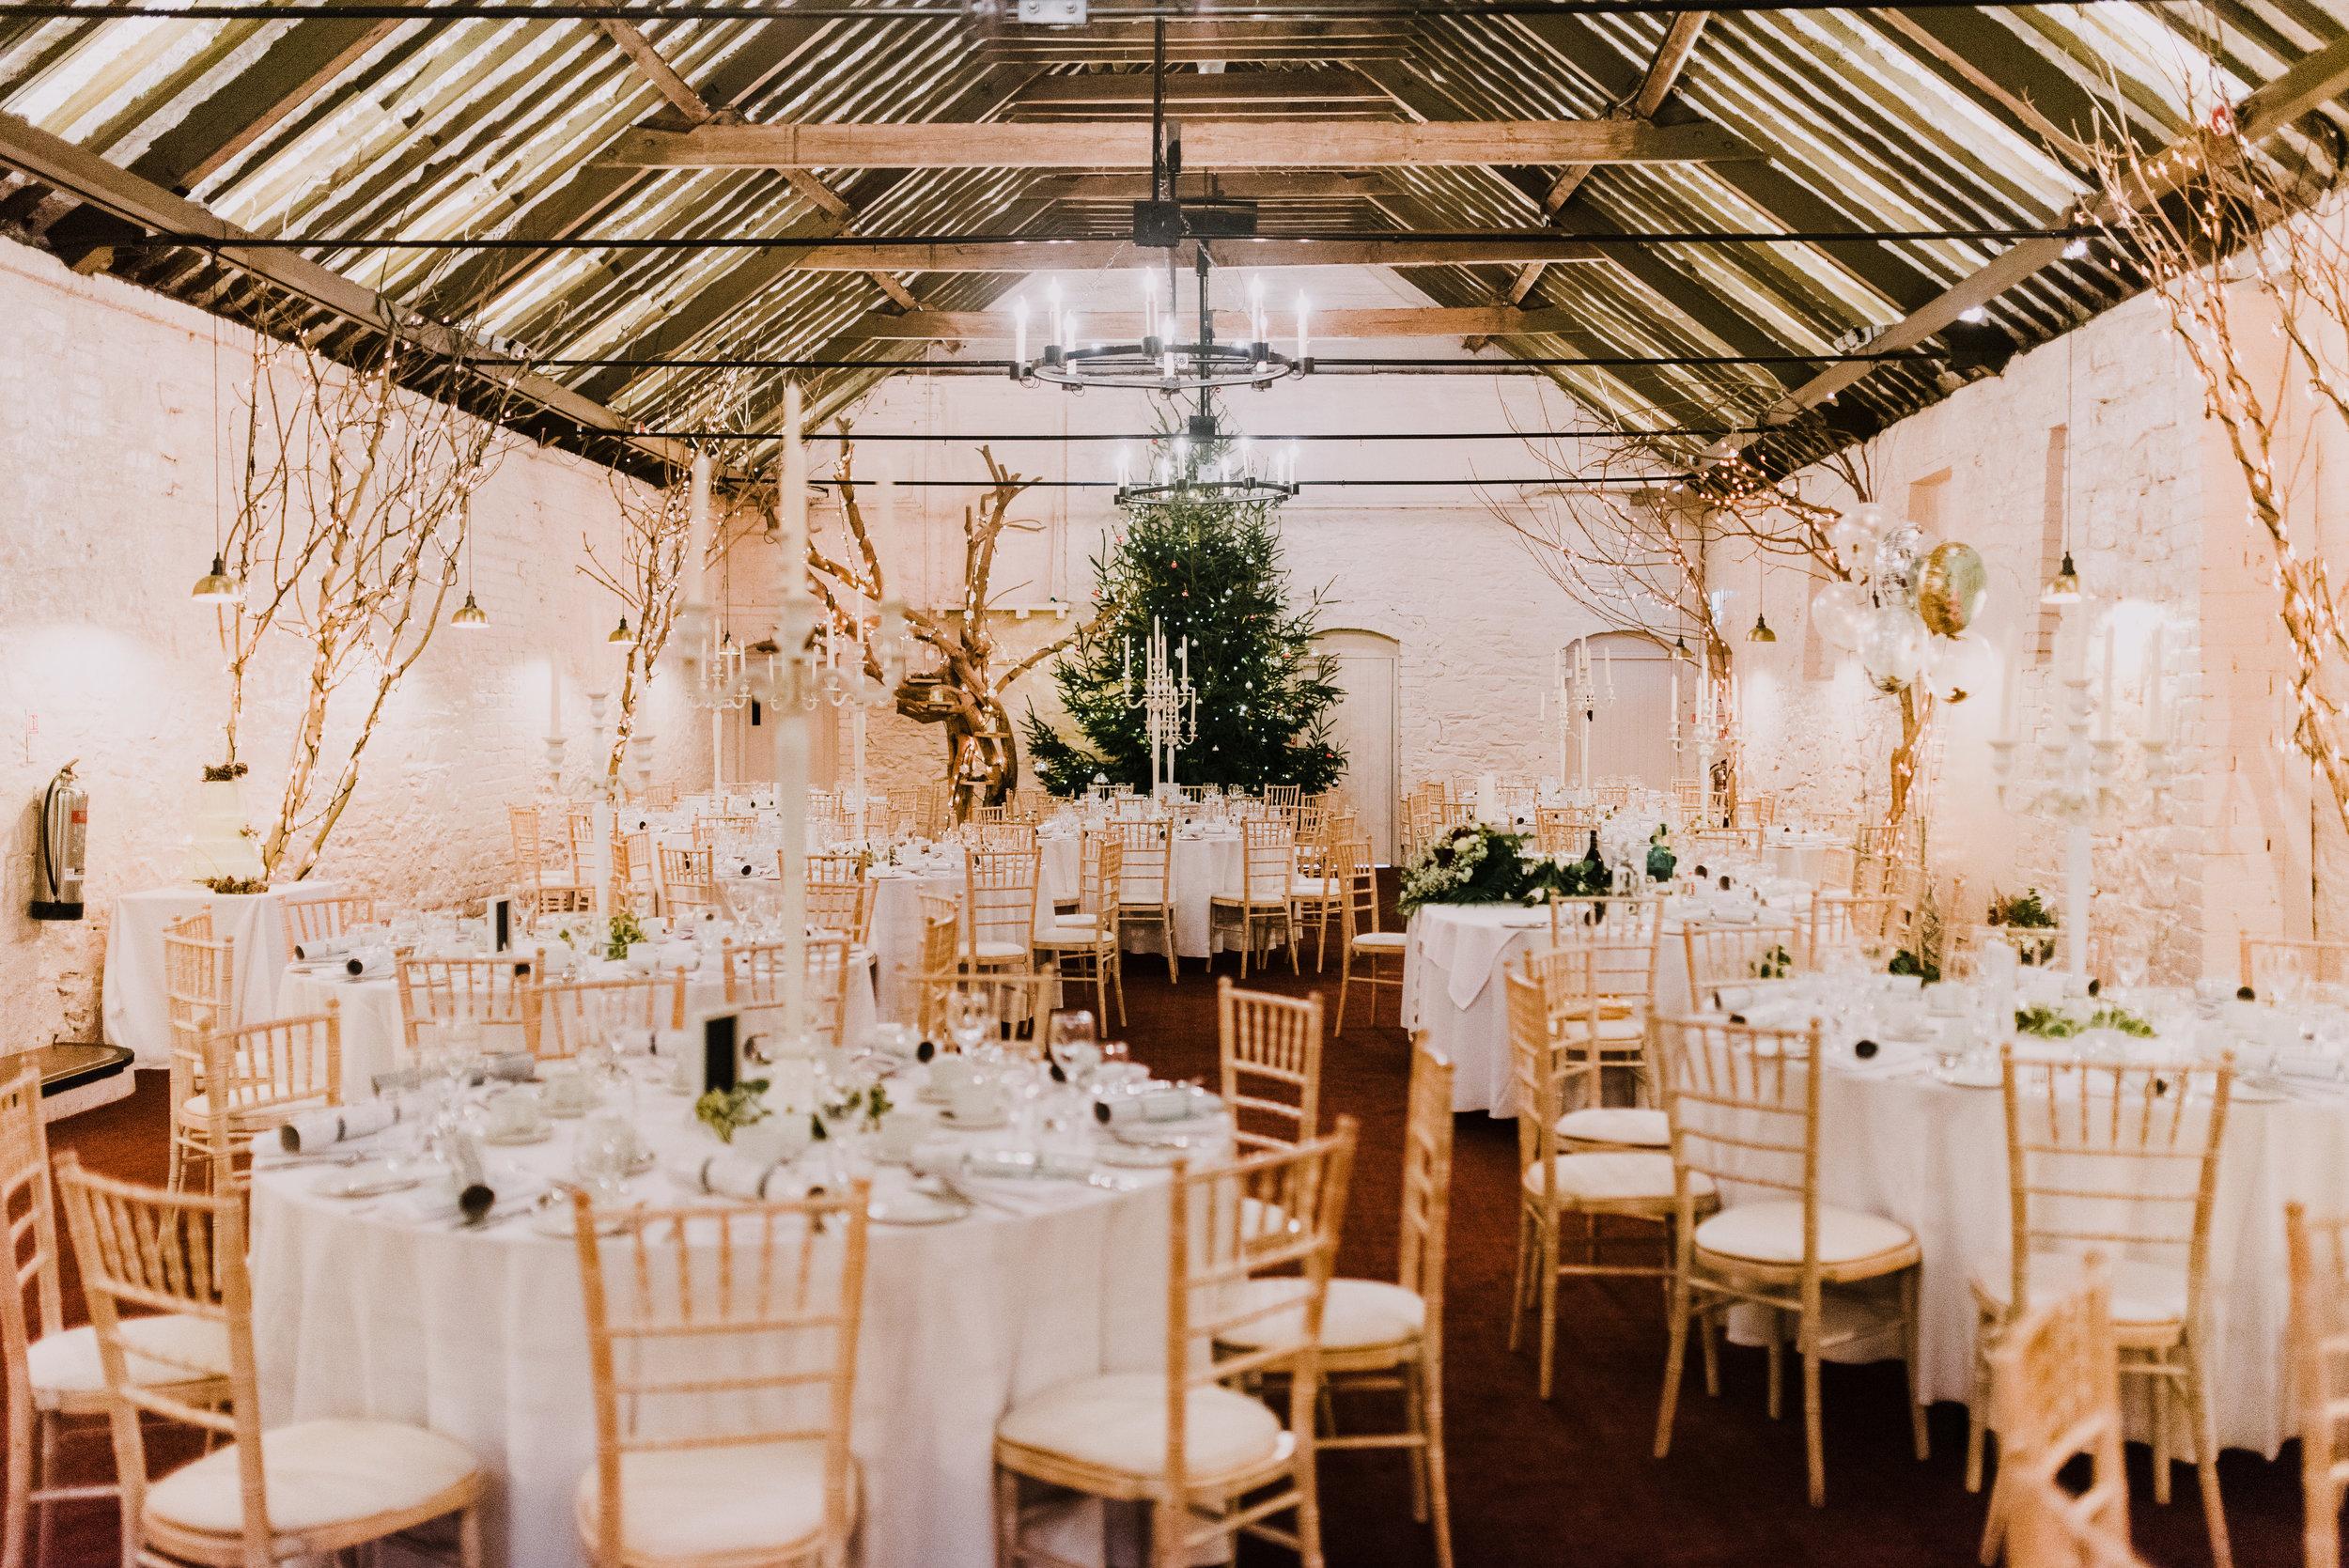 larchfield estate wedding, wedding venues northern ireland, barn wedding venues northern ireland, wedding photos larchfield estate, shane todd wedding, larchfield wedding decor ideas (3).jpg